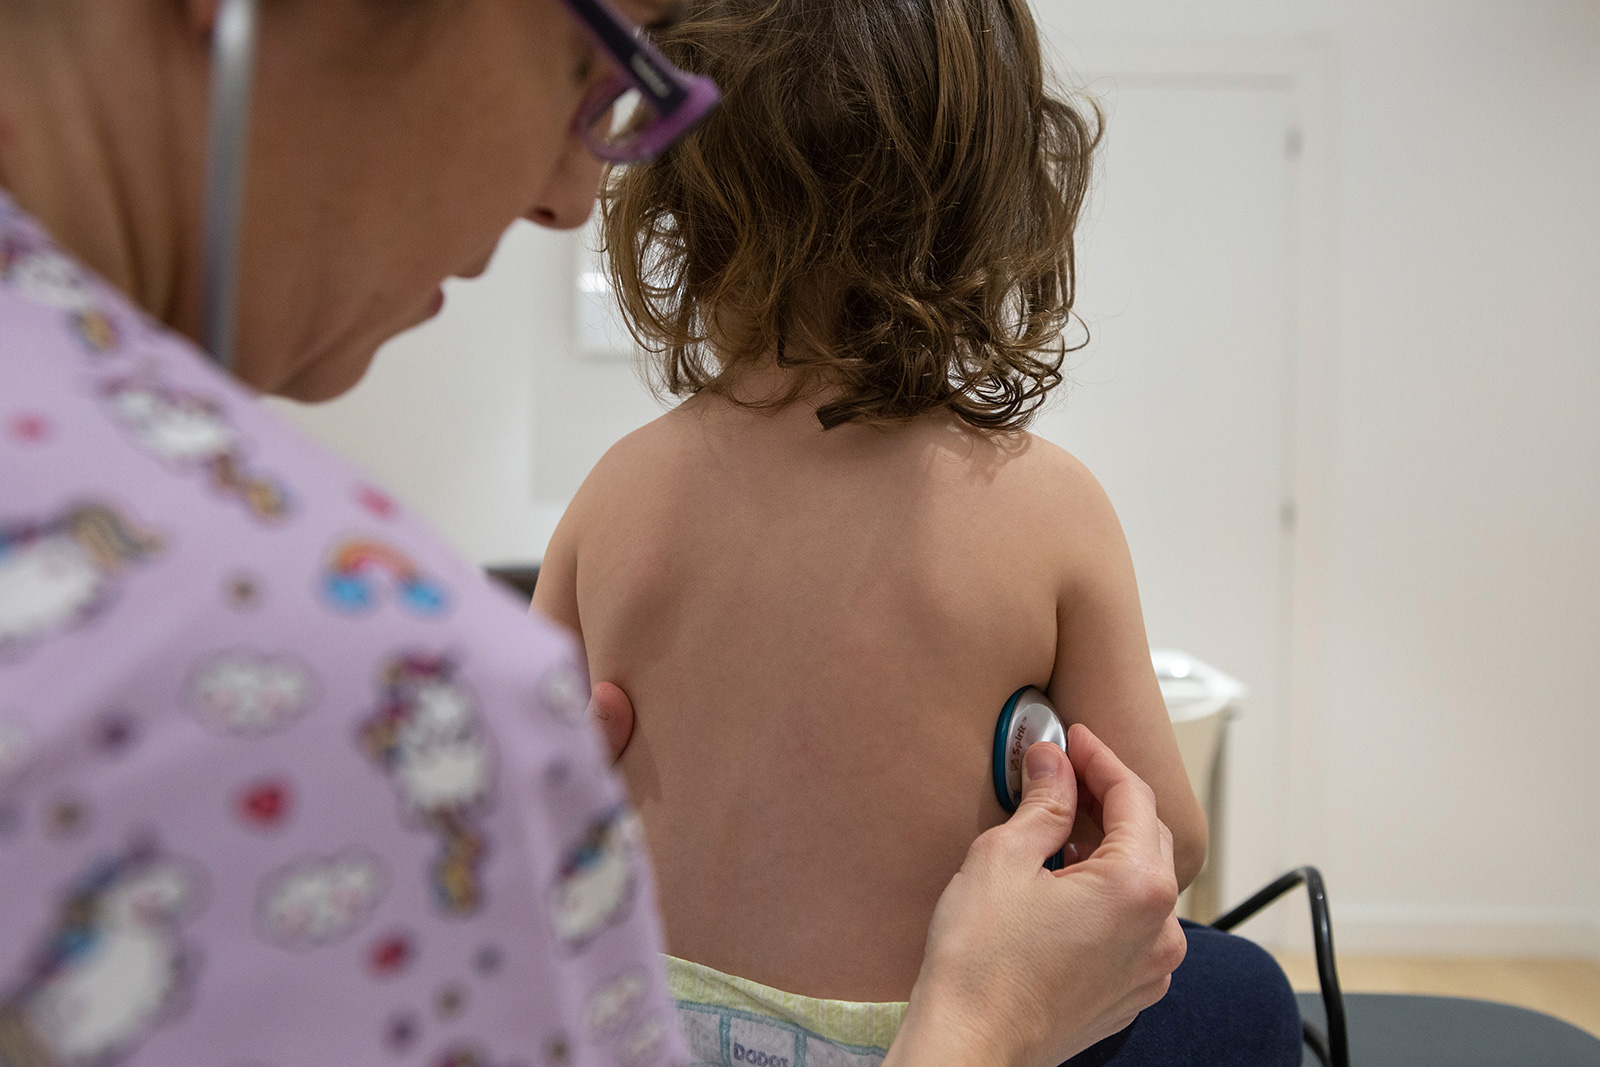 centre-fisioterapia-osteopatia-cfo-mabel-martinez_2840_fisioterapia_materno-infantil